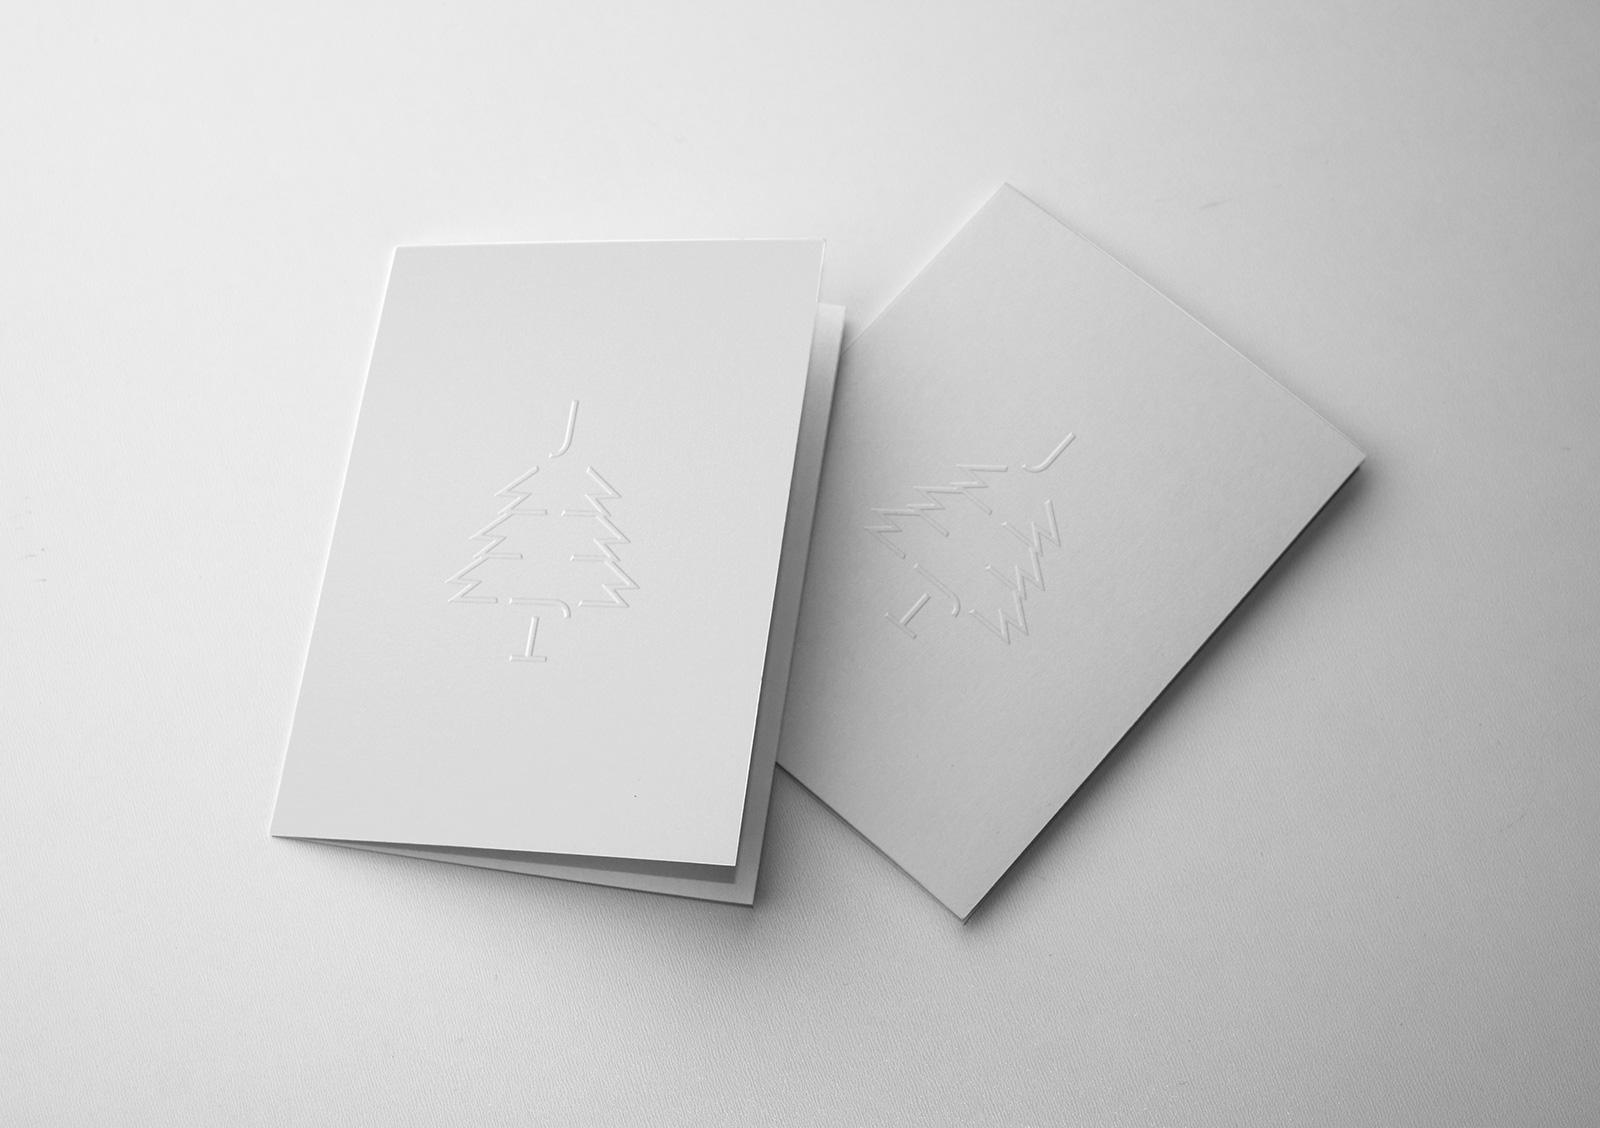 JWTREE_CARD